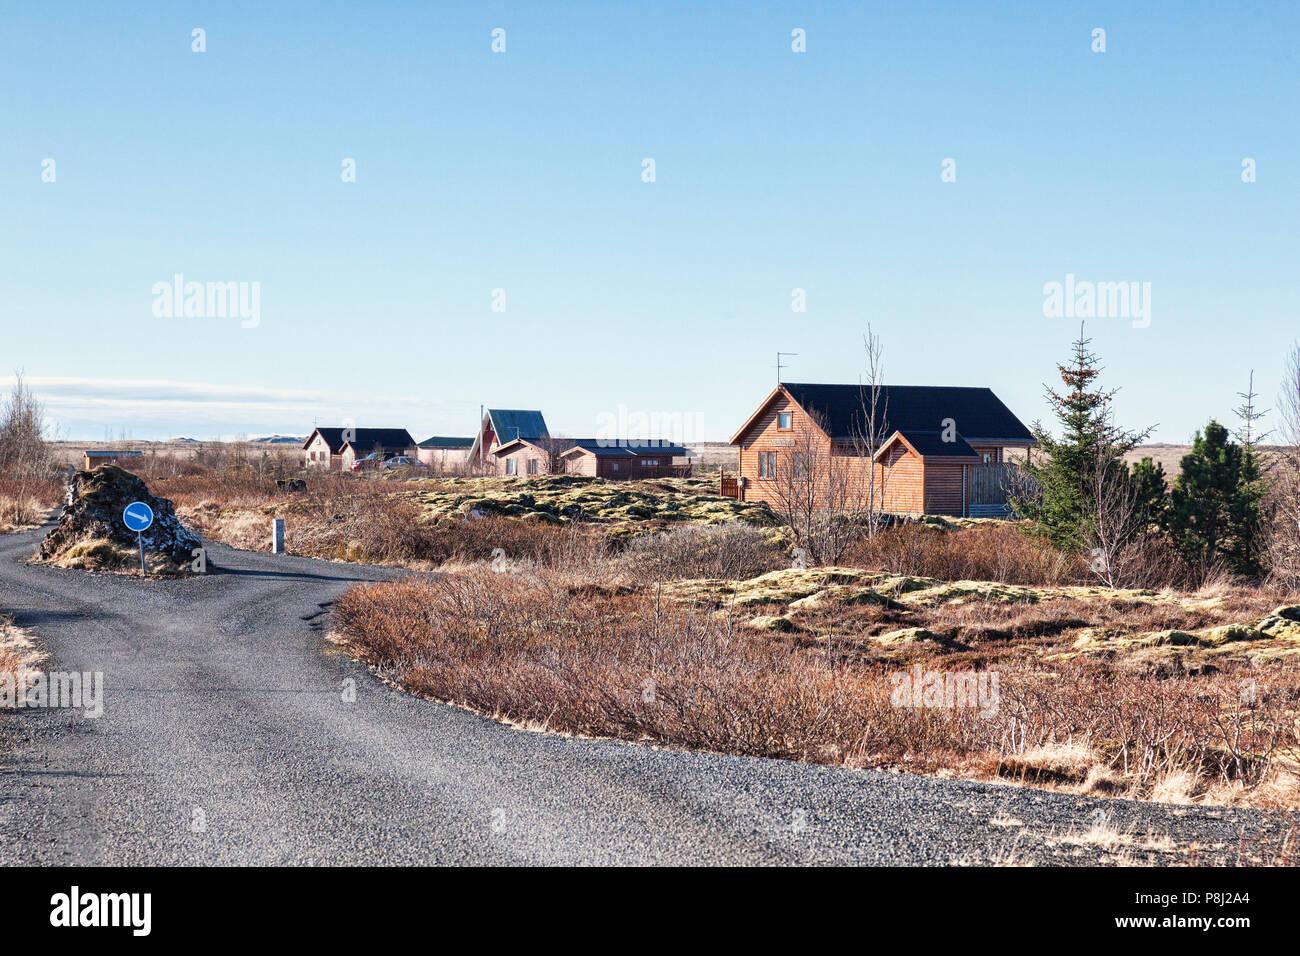 22 Aprile 2018: Grimsnes, Sud Islanda - summerhouses islandese su una chiara mattina. Immagini Stock